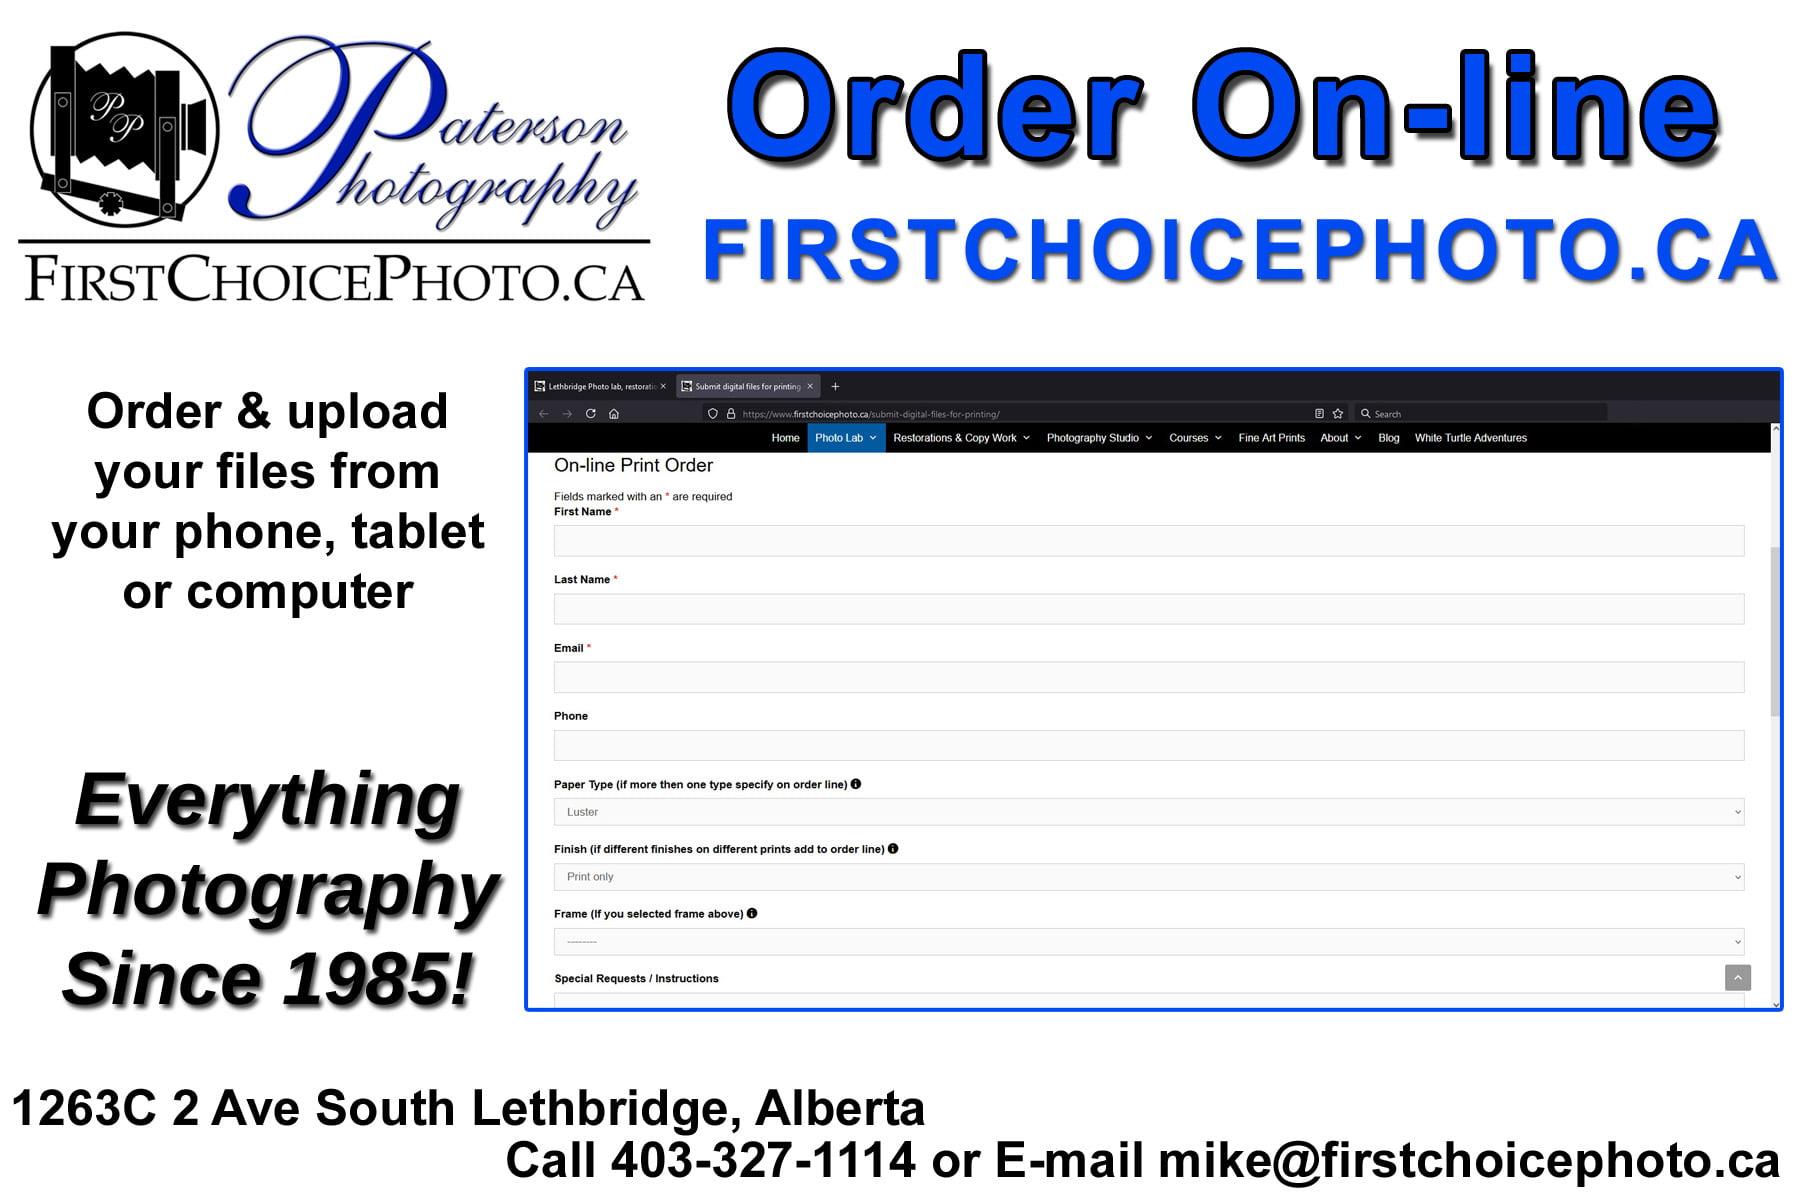 Online print otrder, Photo prints online, order pictures online, Photo lab